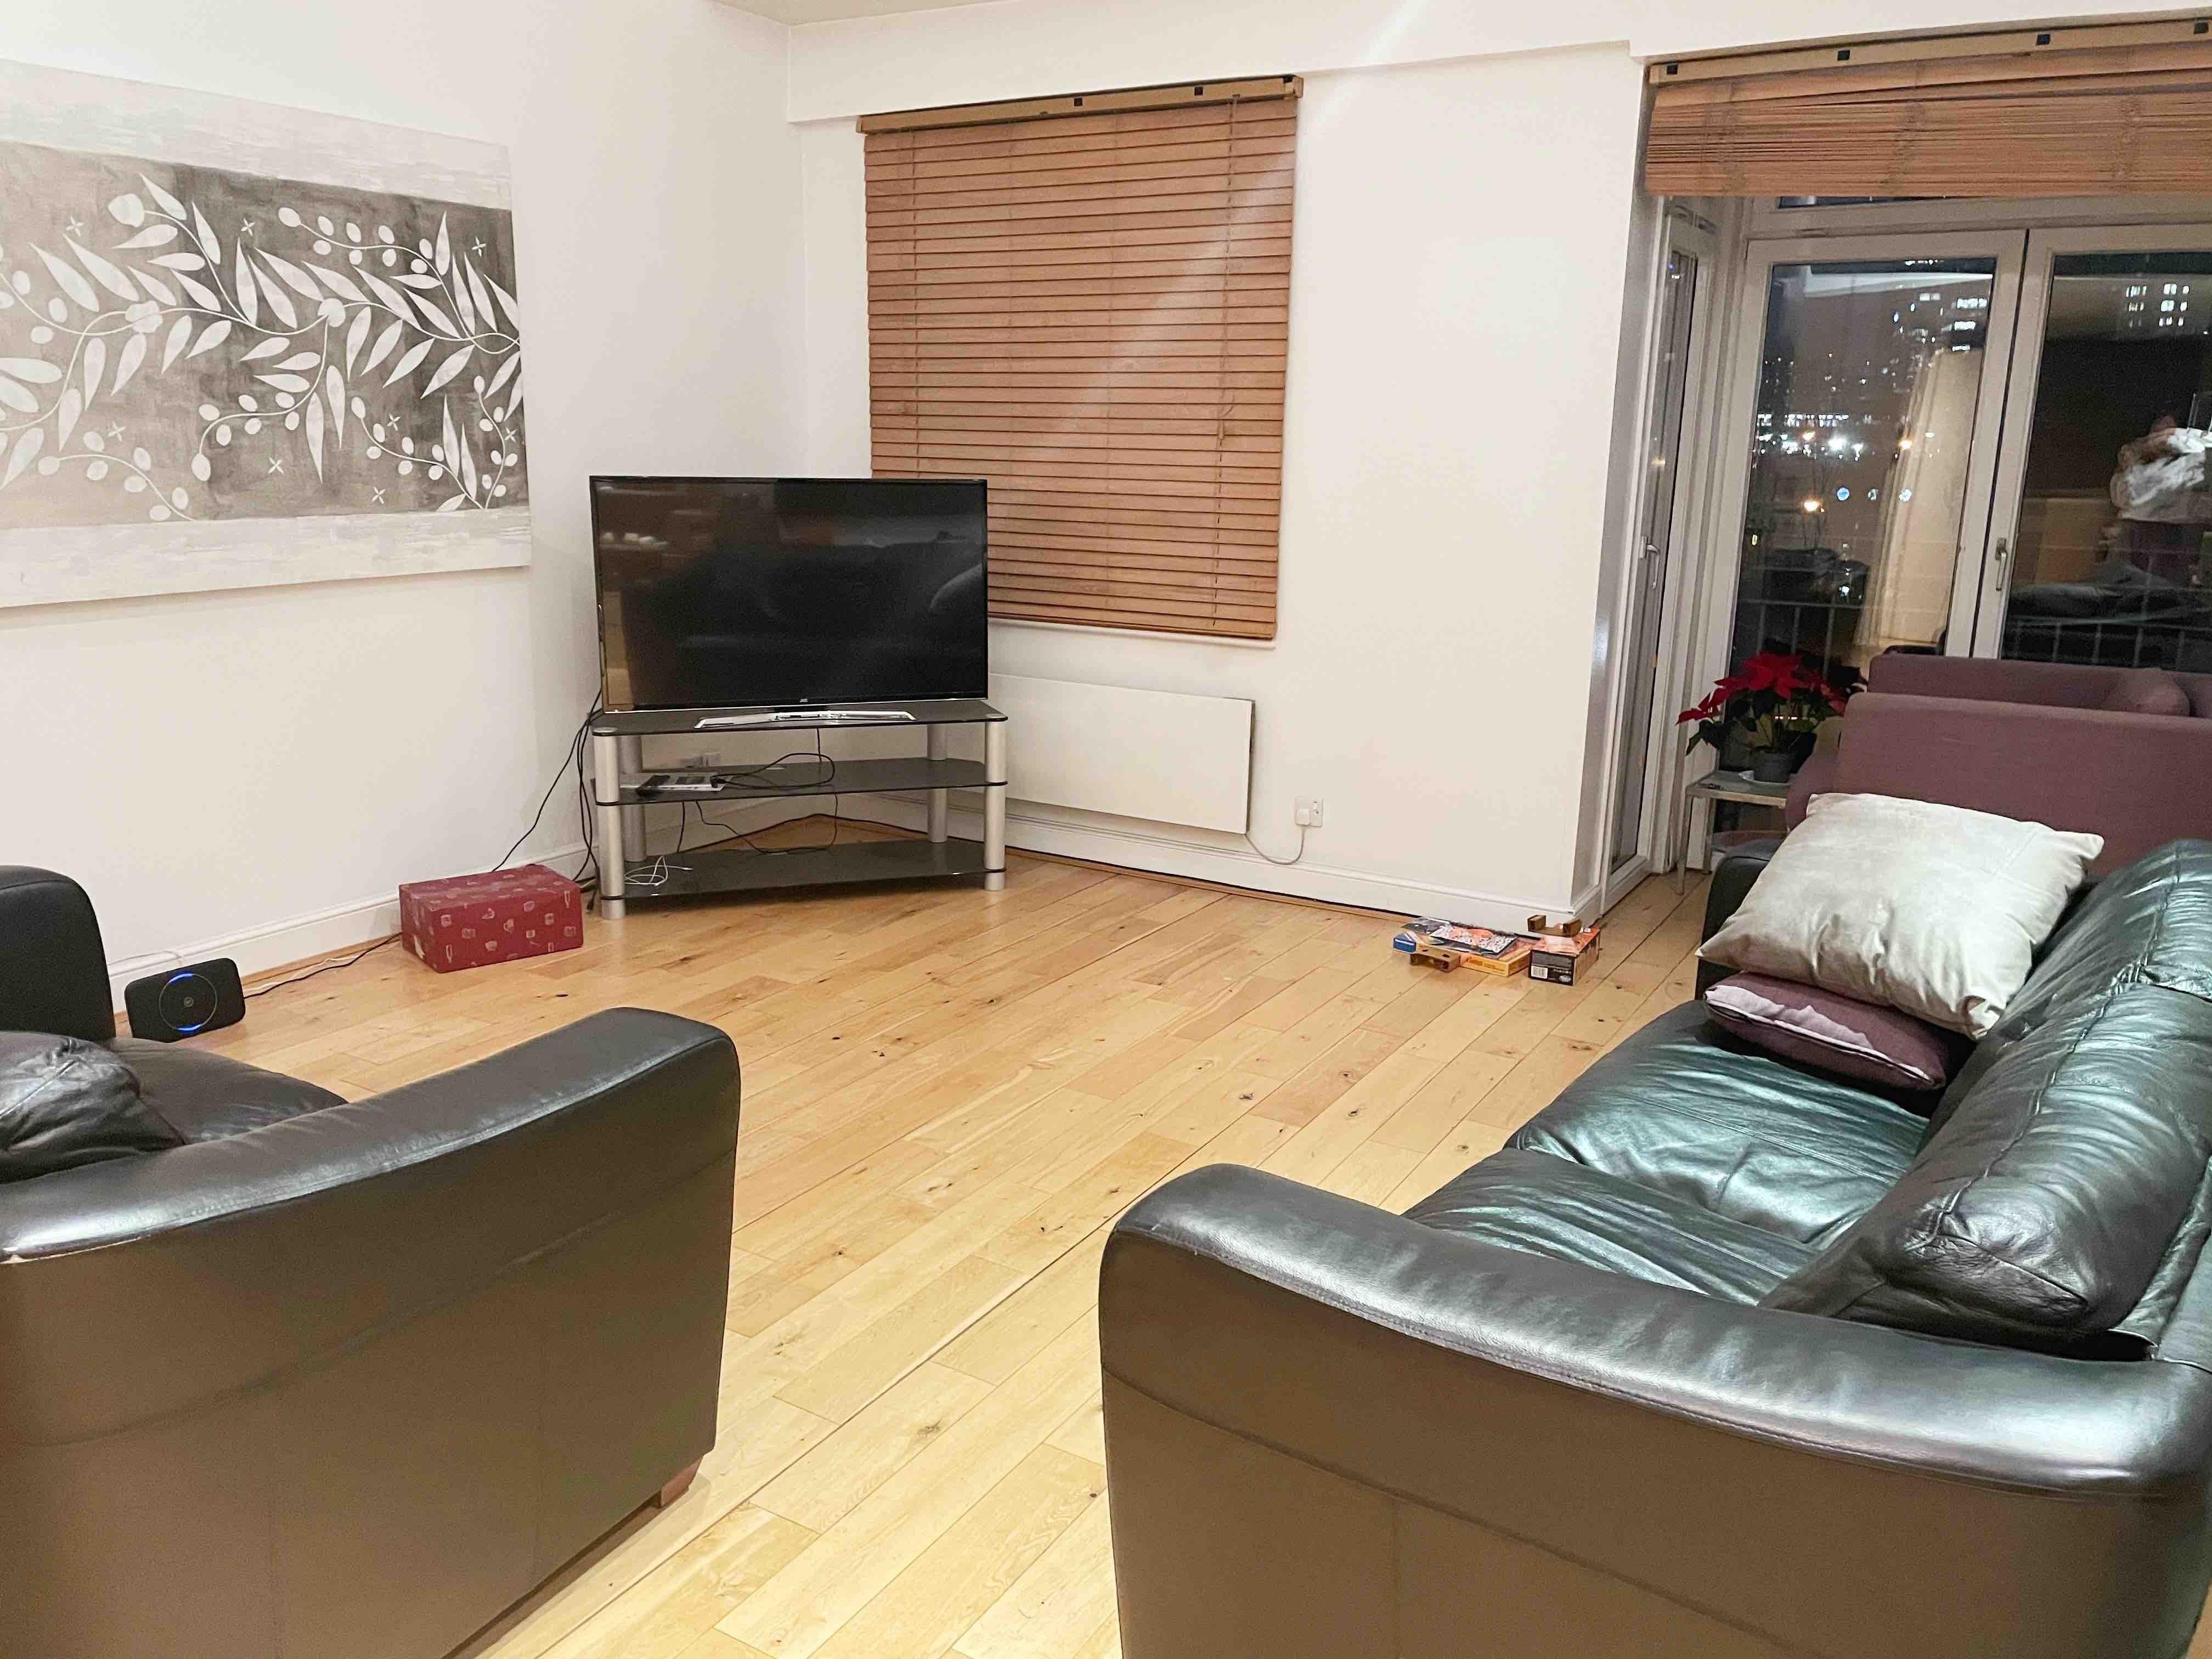 1 room in Canary Wharf, London, E14 8AZ RoomsLocal image